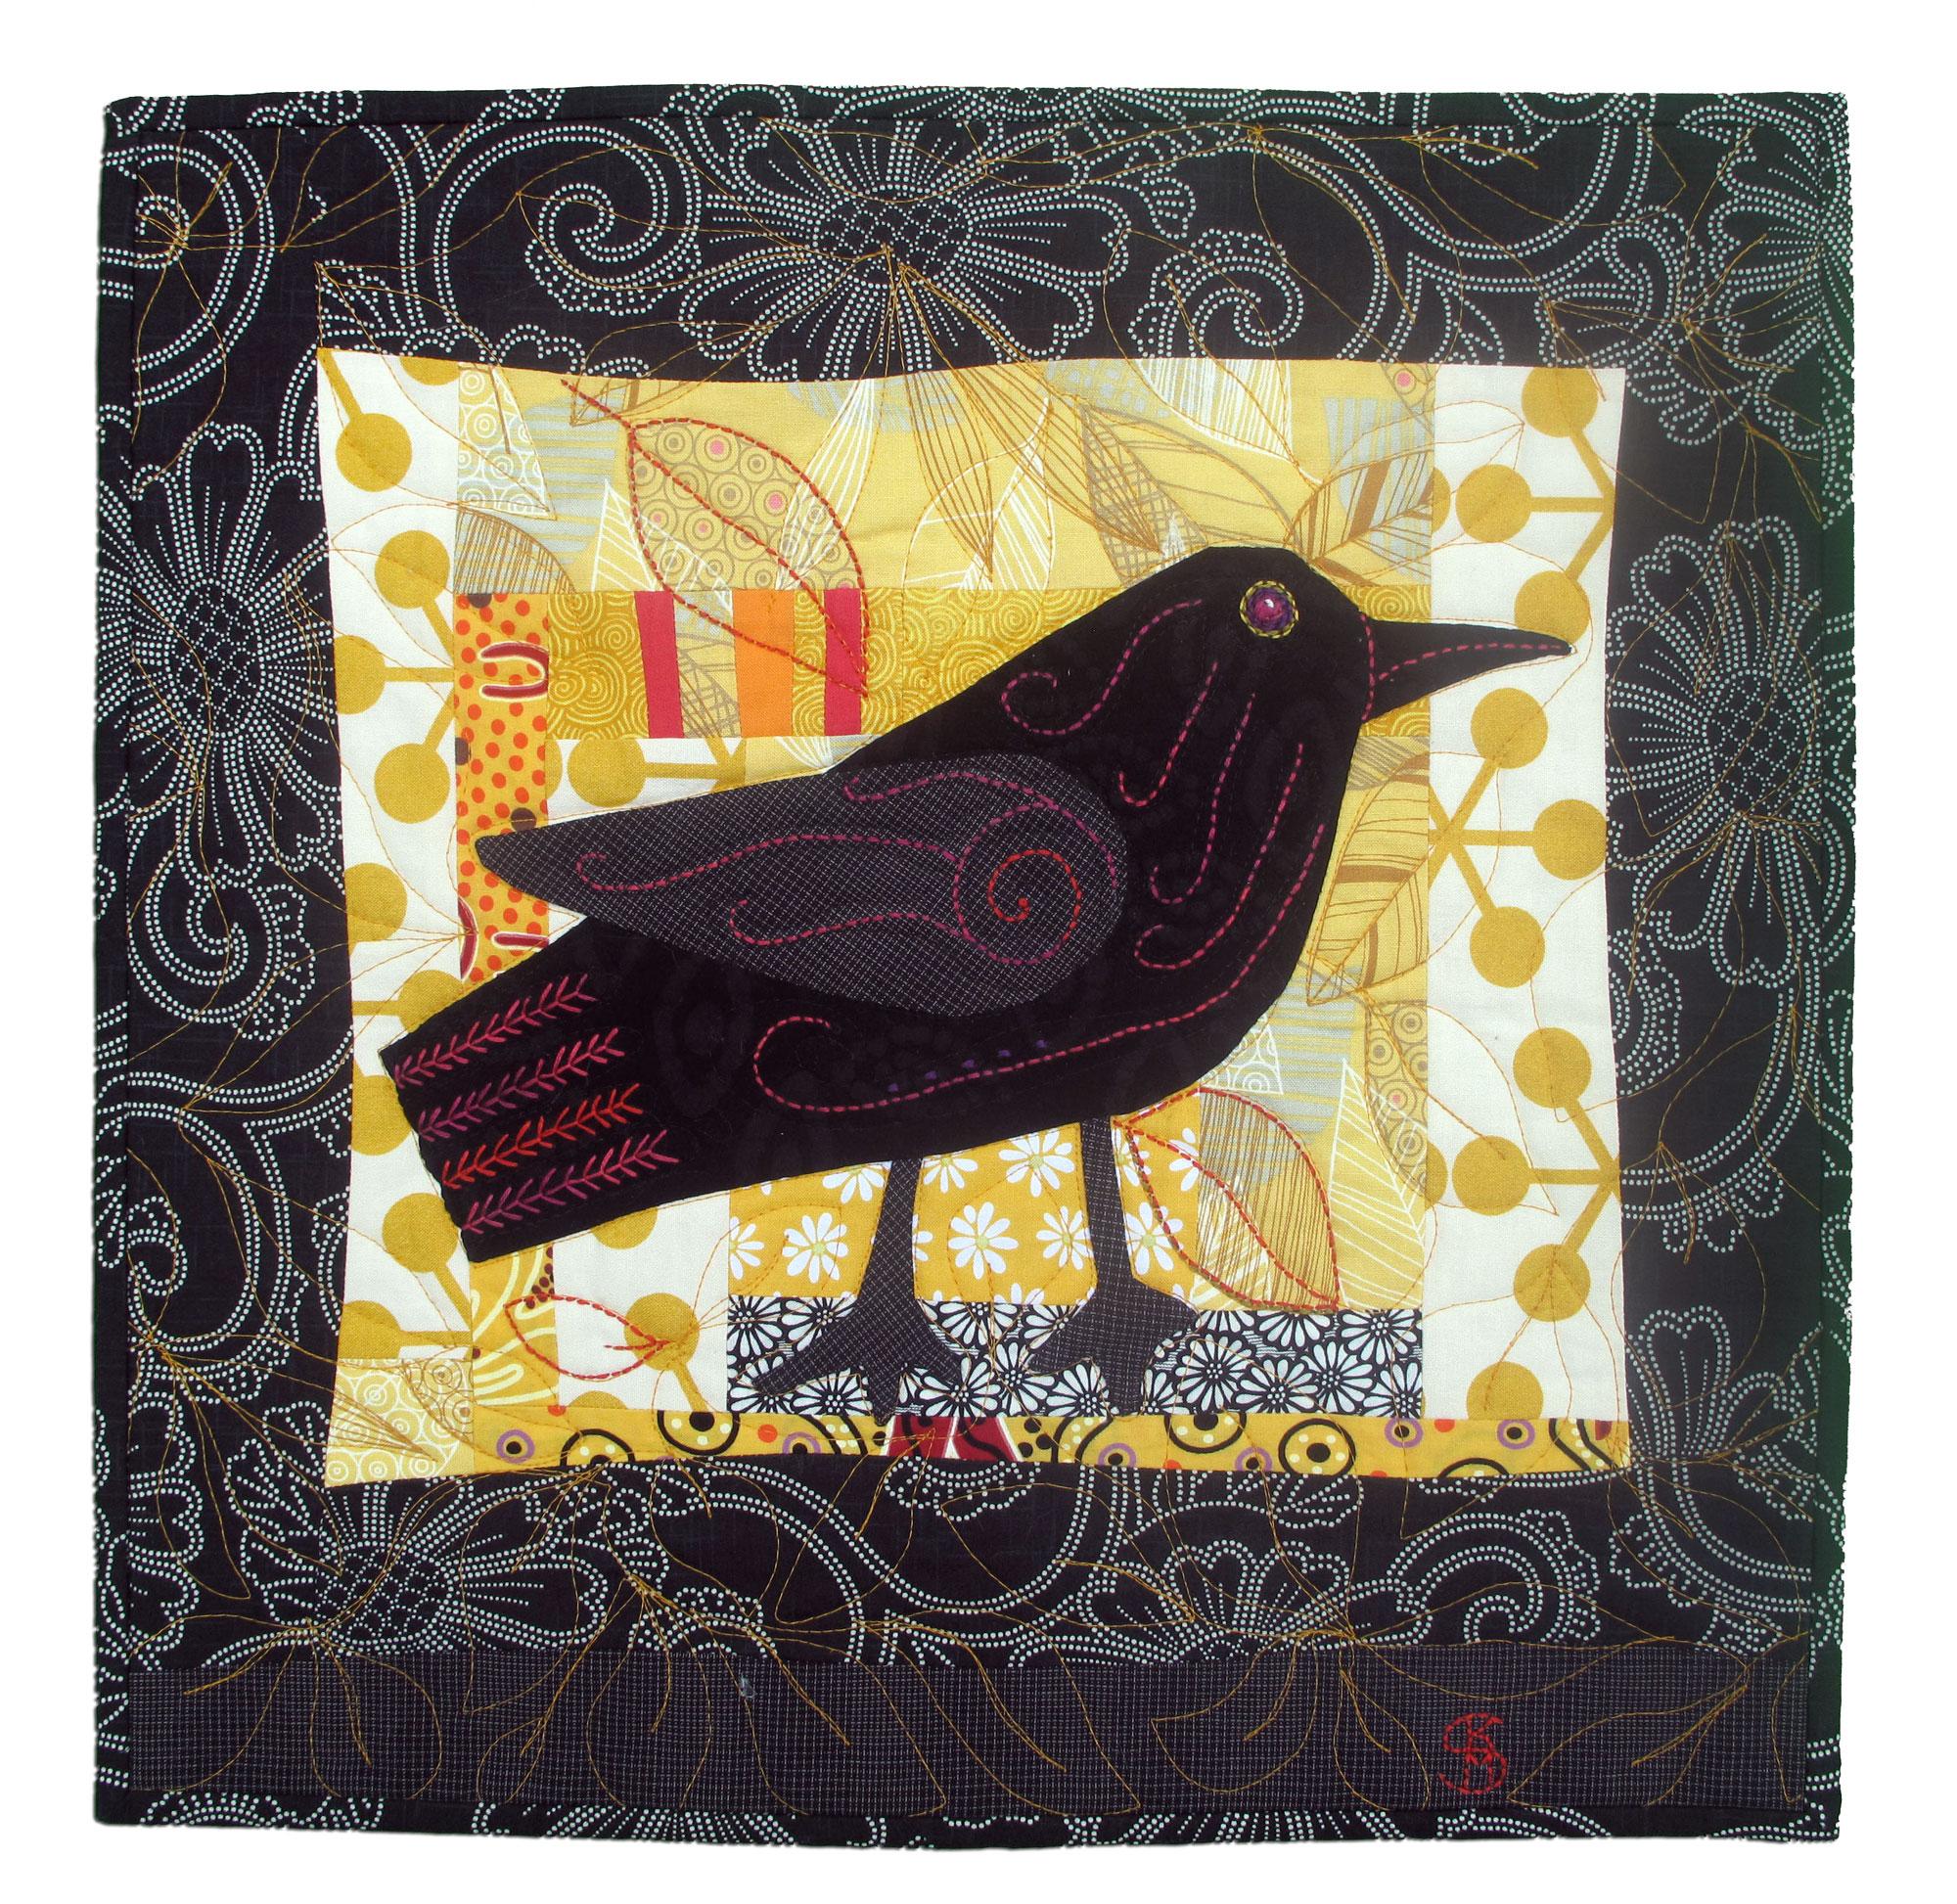 Honorable Mention, Smarter Than the Average Bird, Kristin Shields, Bend, Oregon